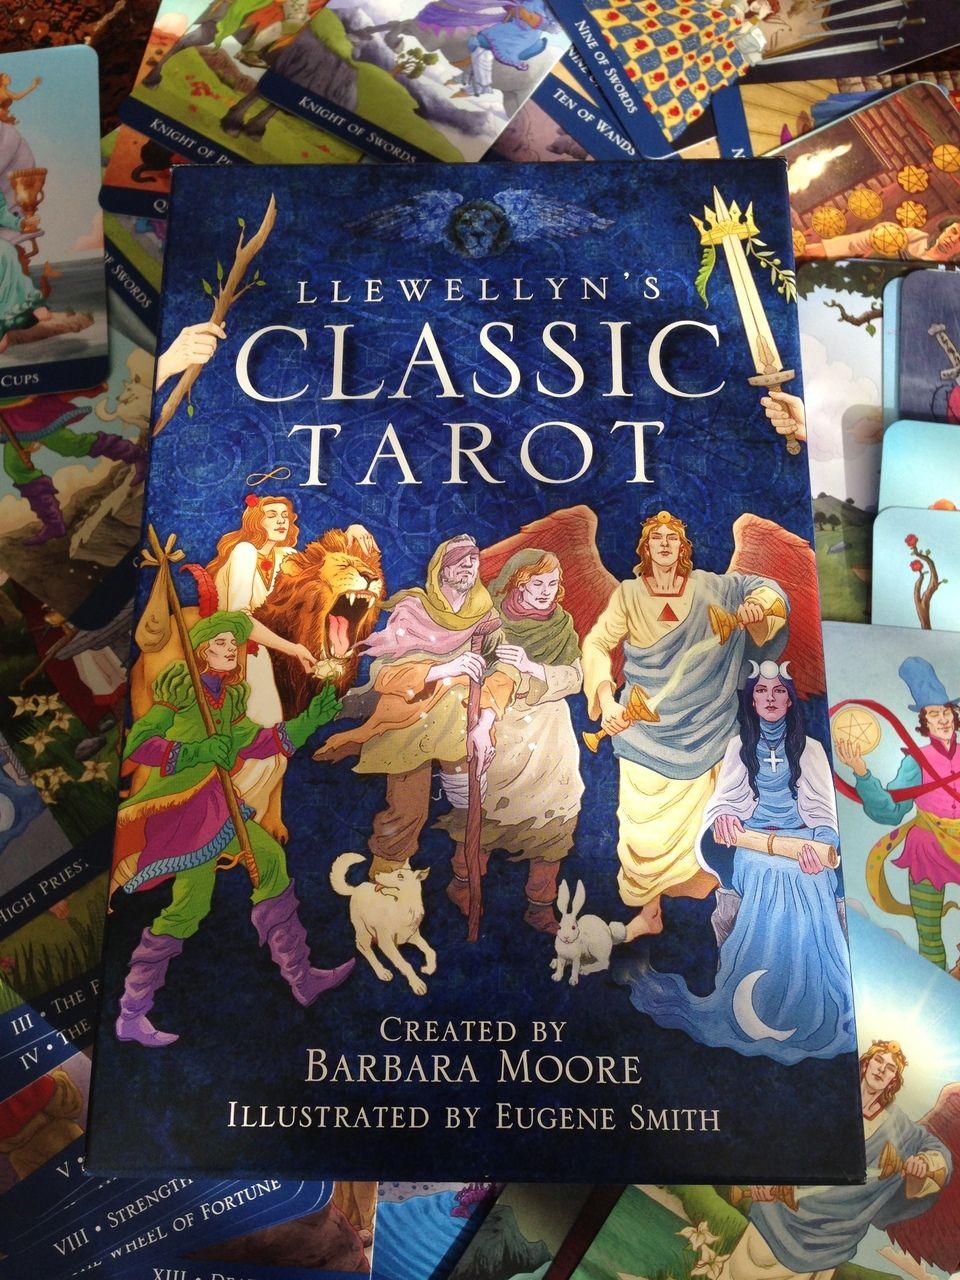 Llewellyn's Classic Tarot Deck created by Barbara Moore #metaphysical #SageGoddess #divination #Tarot #TarotDeck